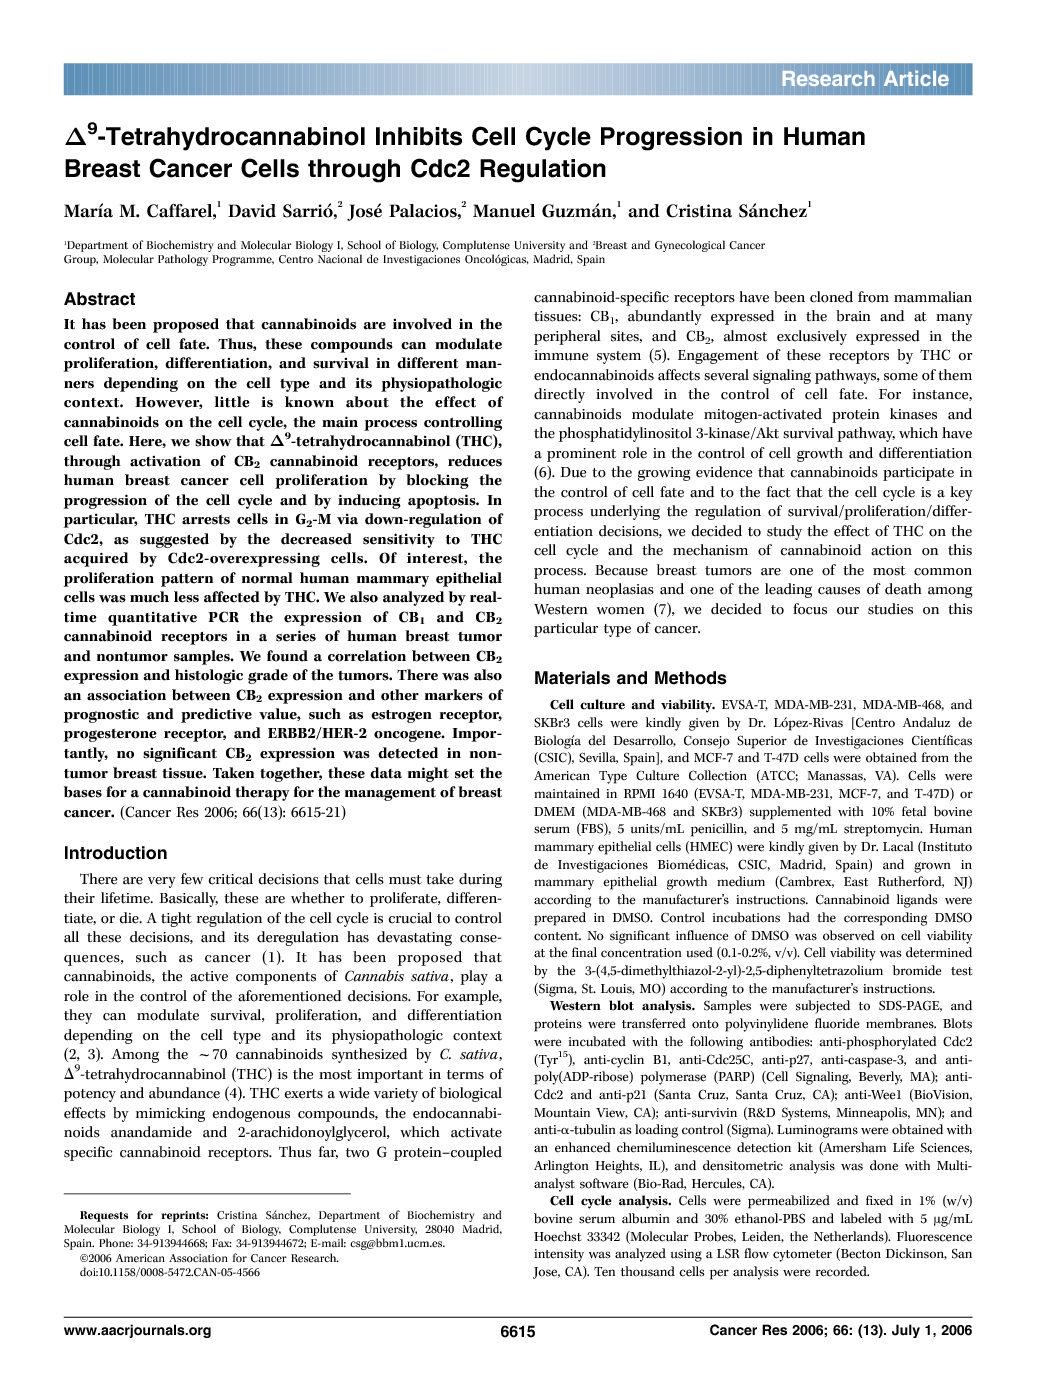 9 Tetrahydrocannabinol Inhibits Cell Cycle Progression In